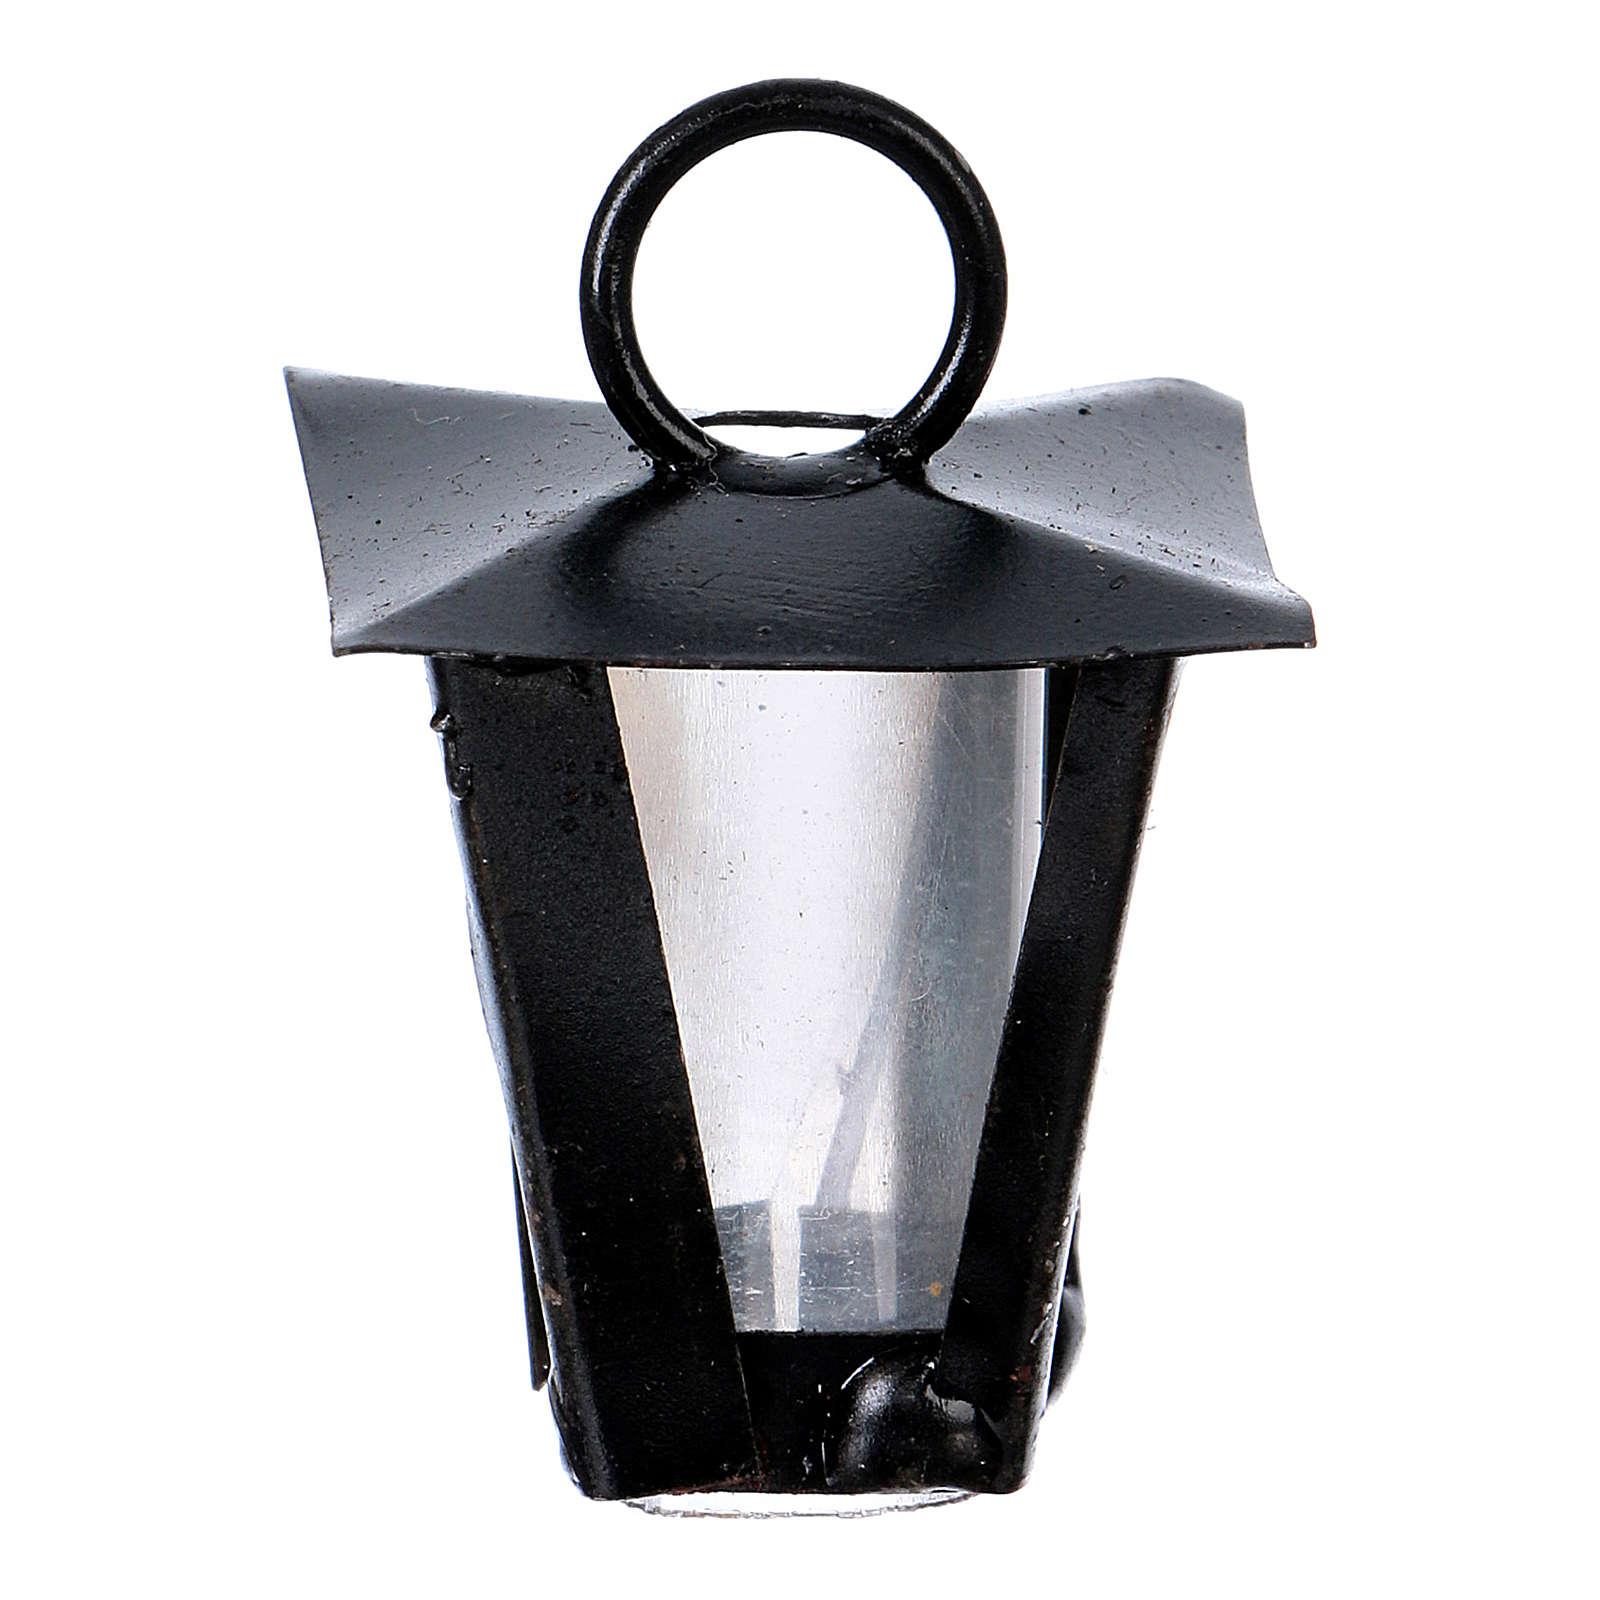 Lanterna presepe fai da te h reale 2,5 cm - 12V 4